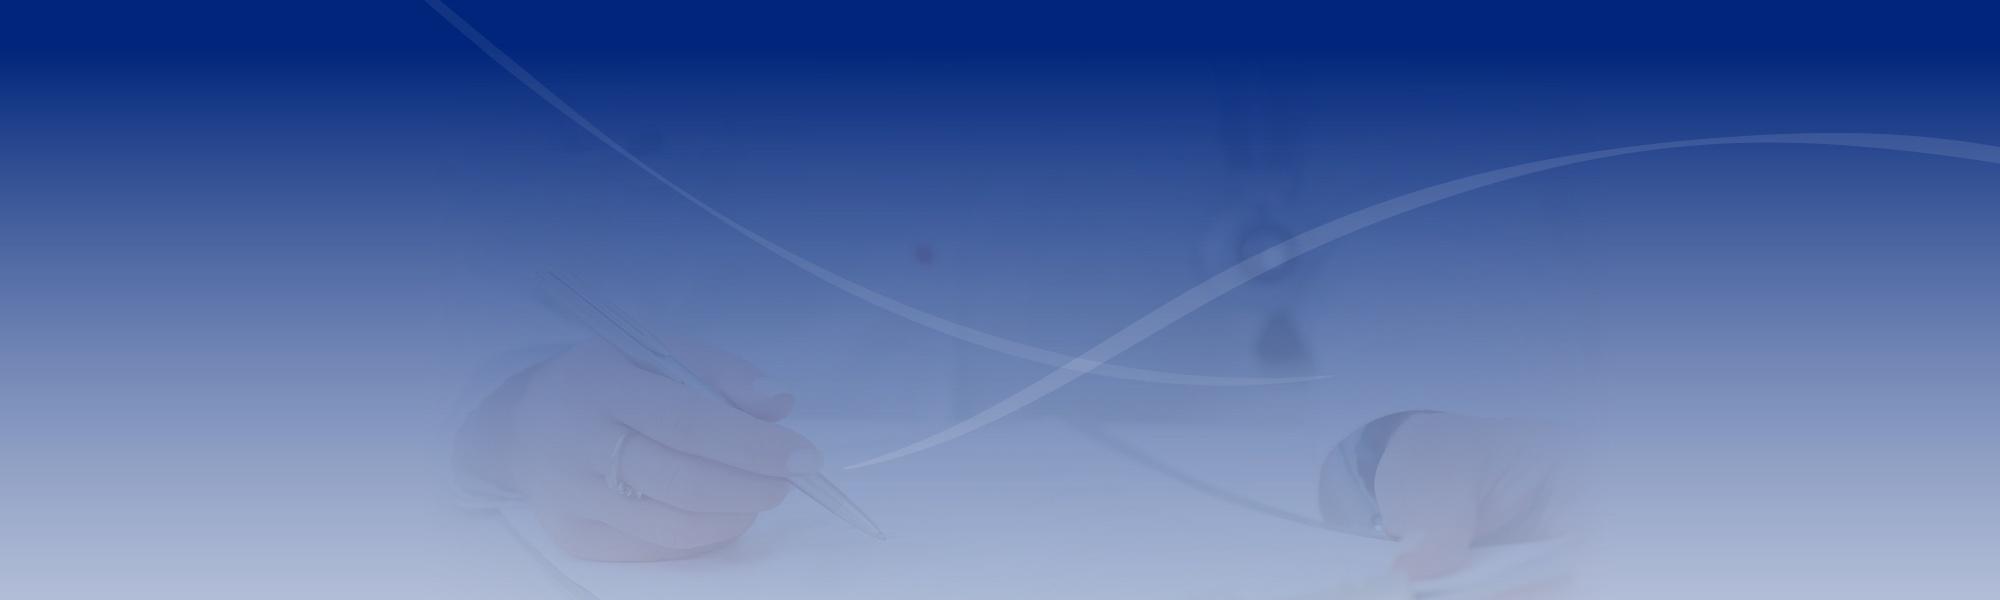 CDI-Banner-2.jpg